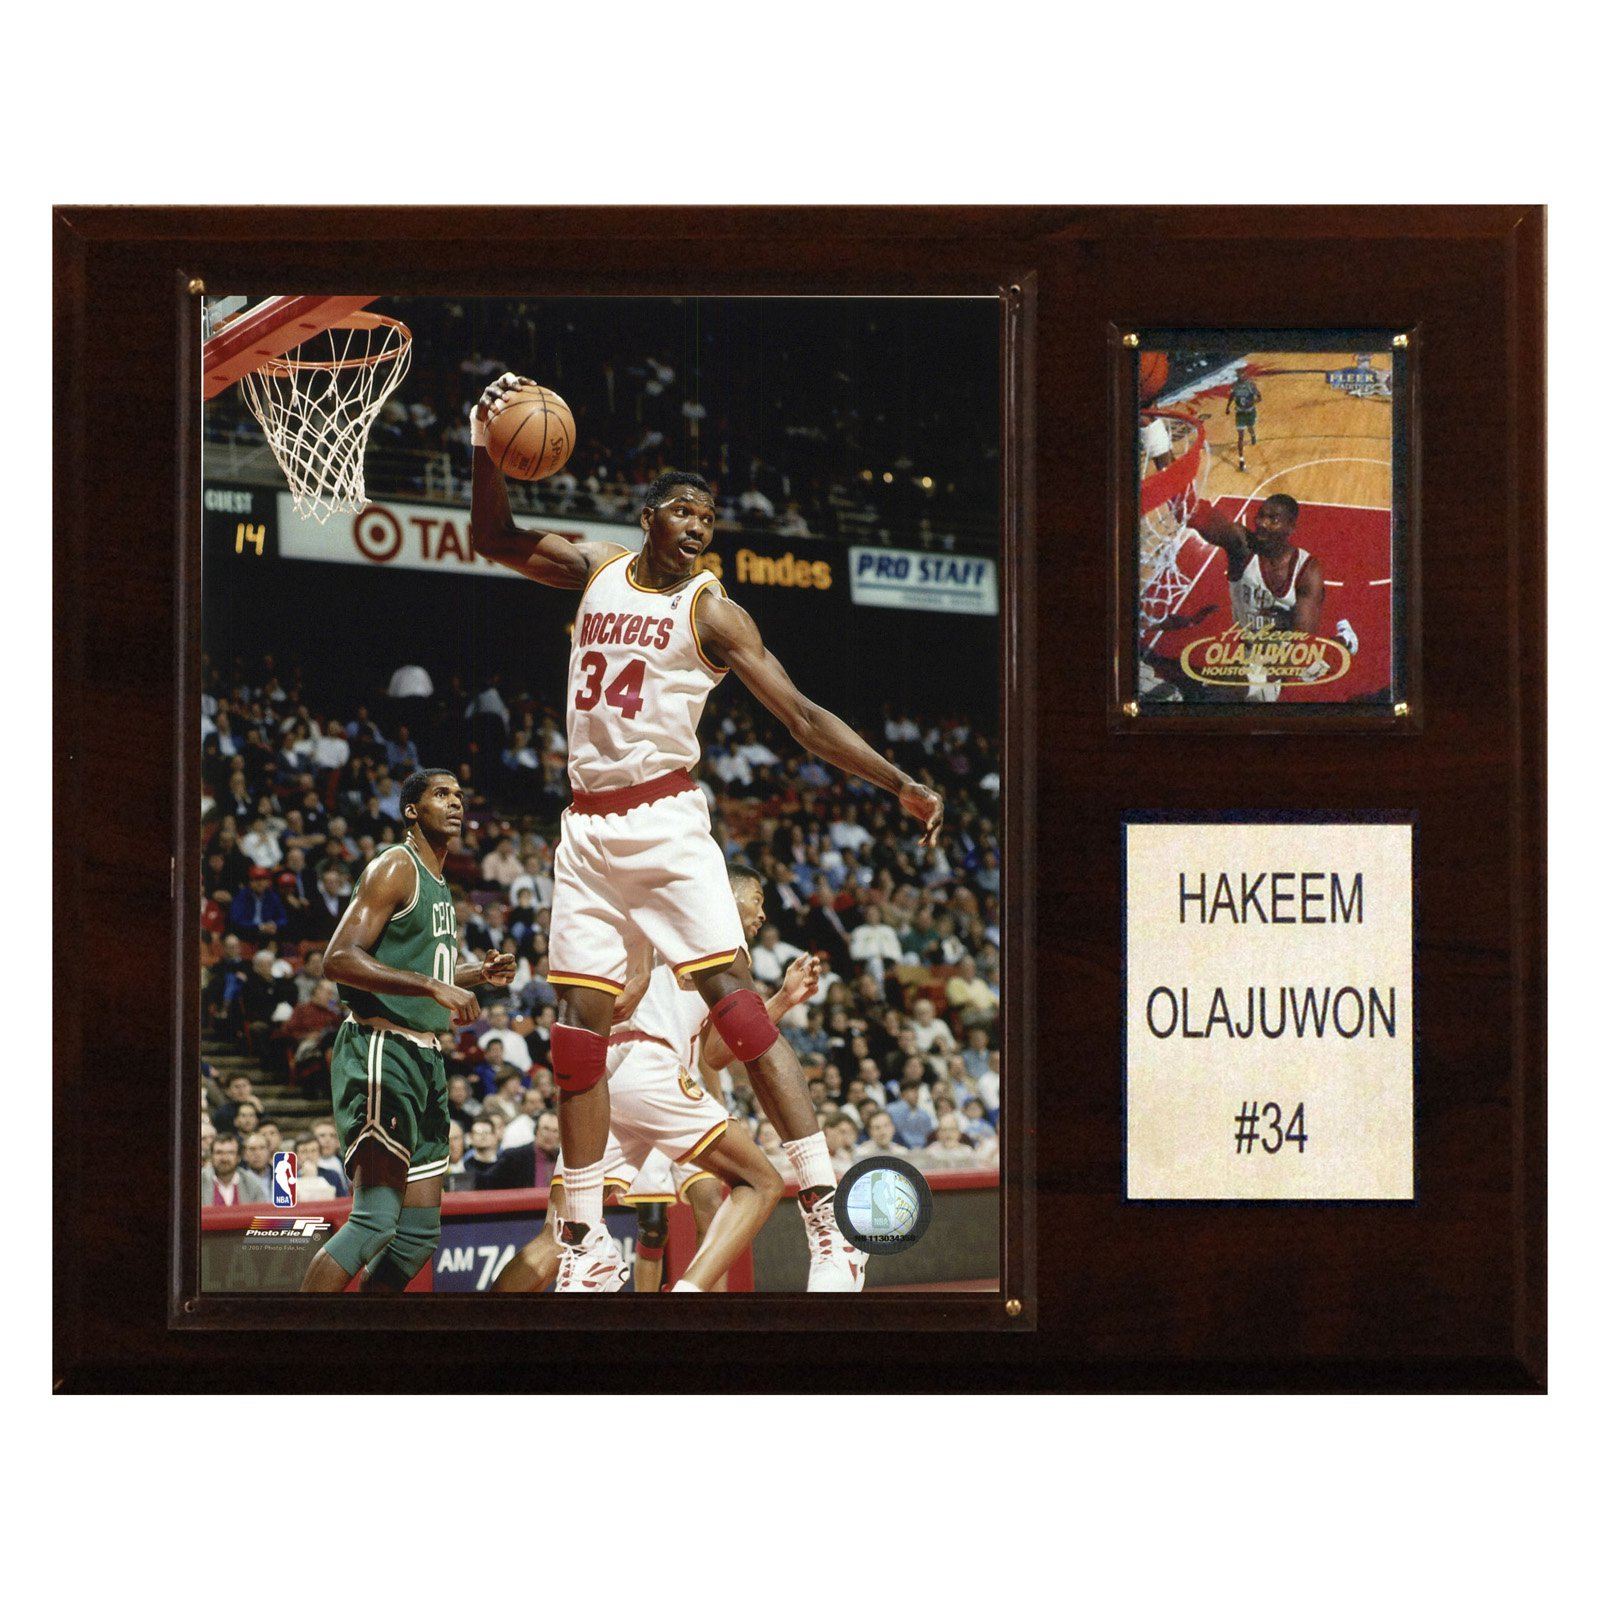 C&I Collectables NBA 12x15 Hakeem Olajuwon Houston Rockets Player Plaque